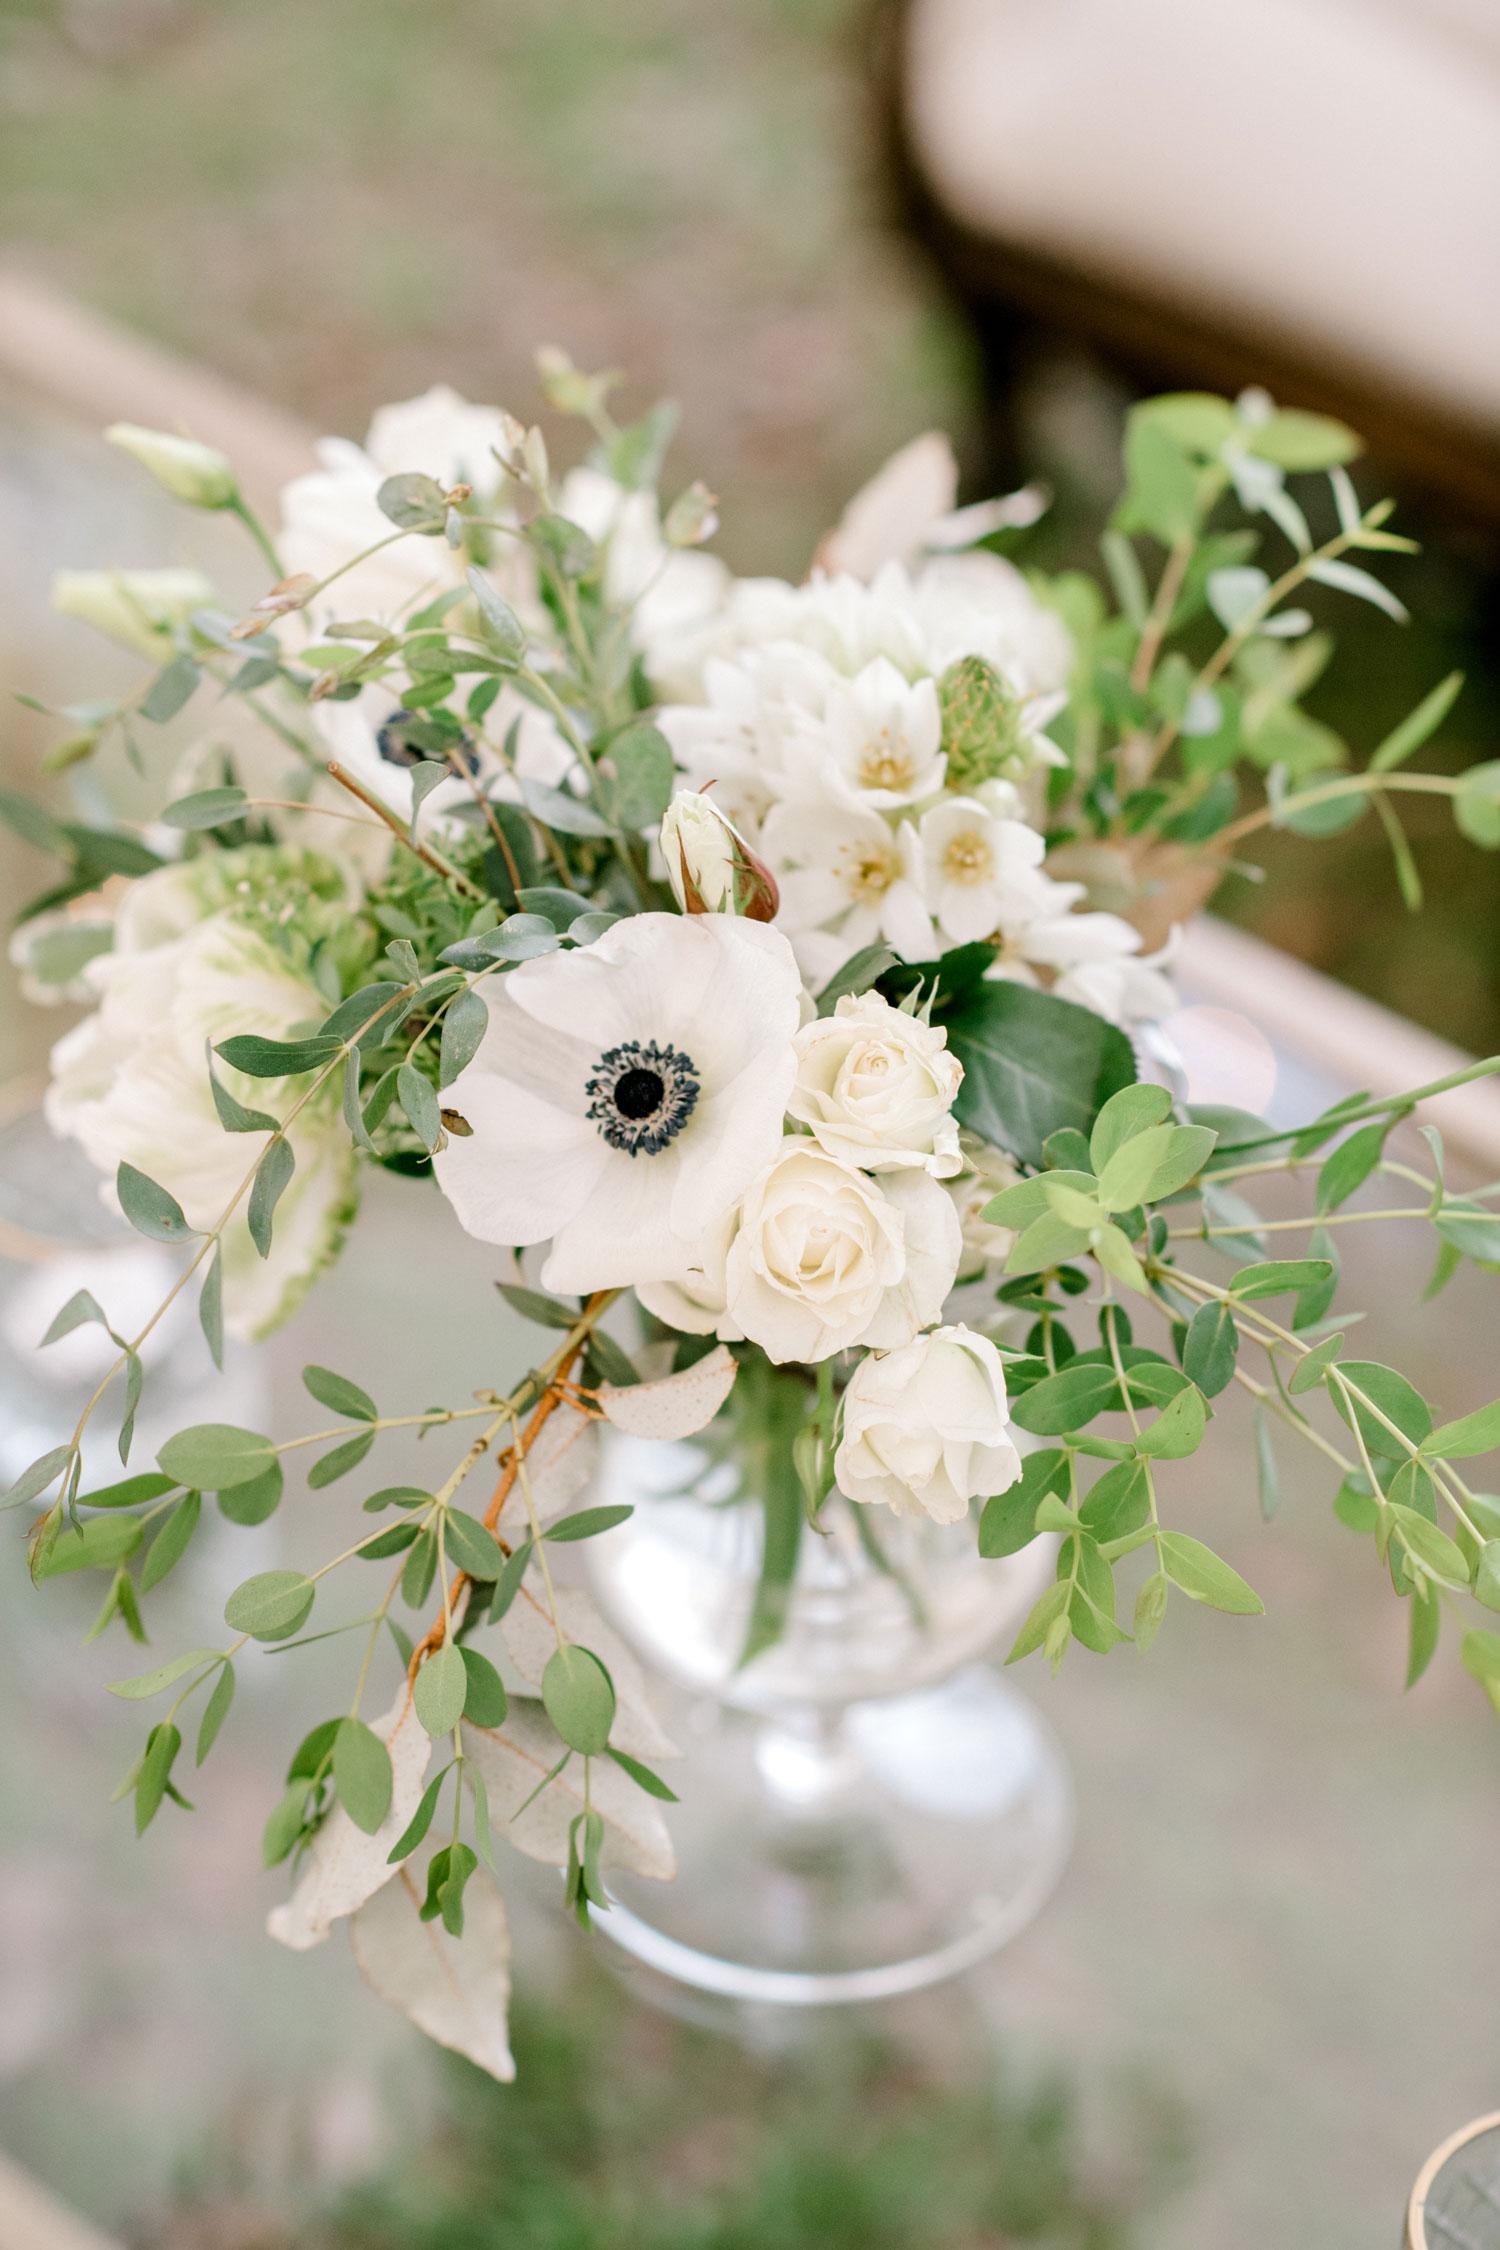 Wedding Trend Using Anemone Flowers In Decor